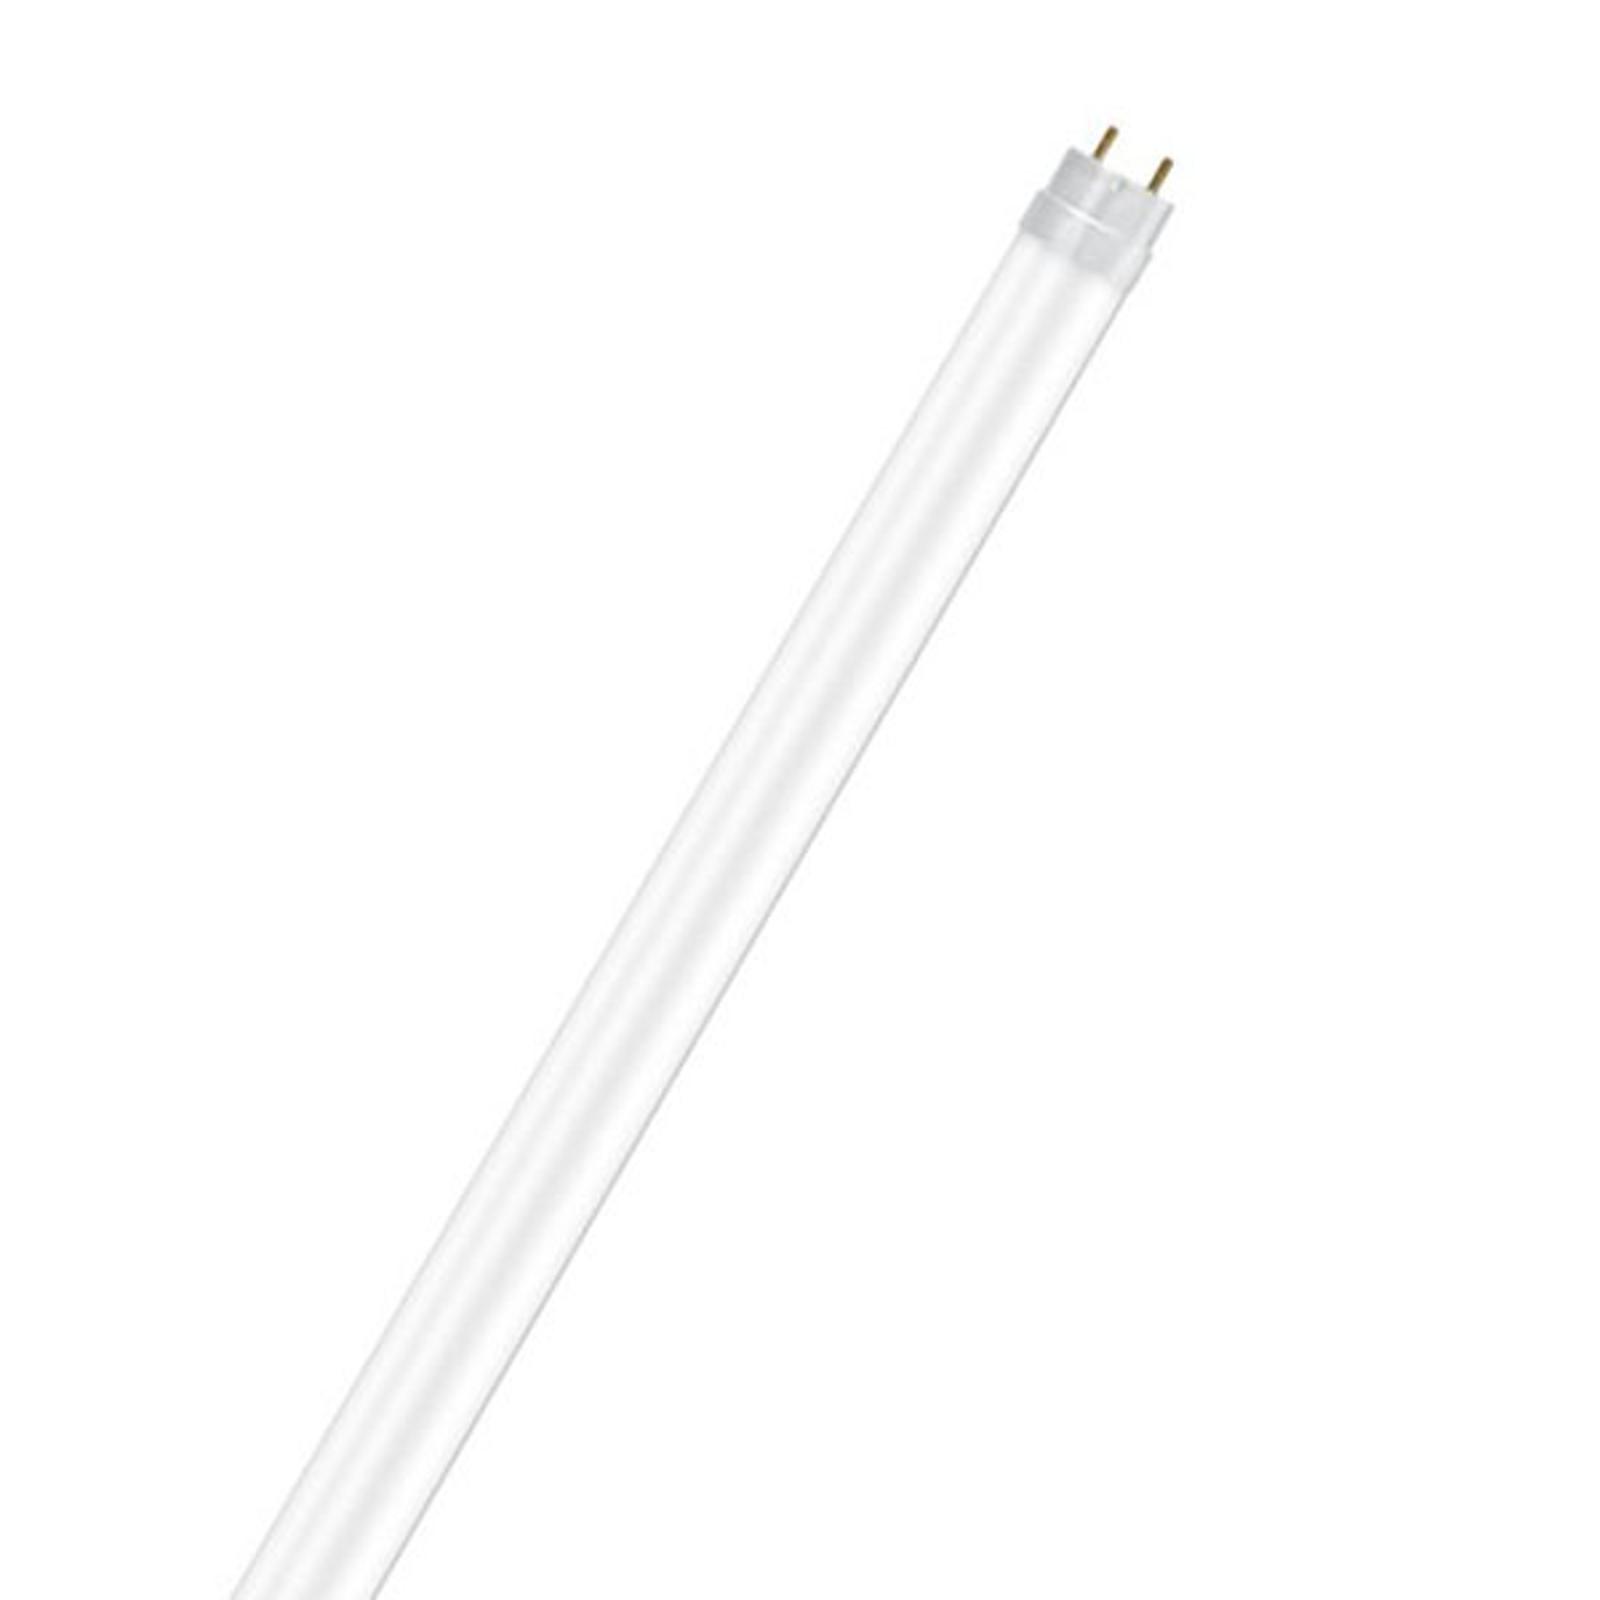 OSRAM-LED-putki G13 150cm SubstiTUBE 20W 3 000 K